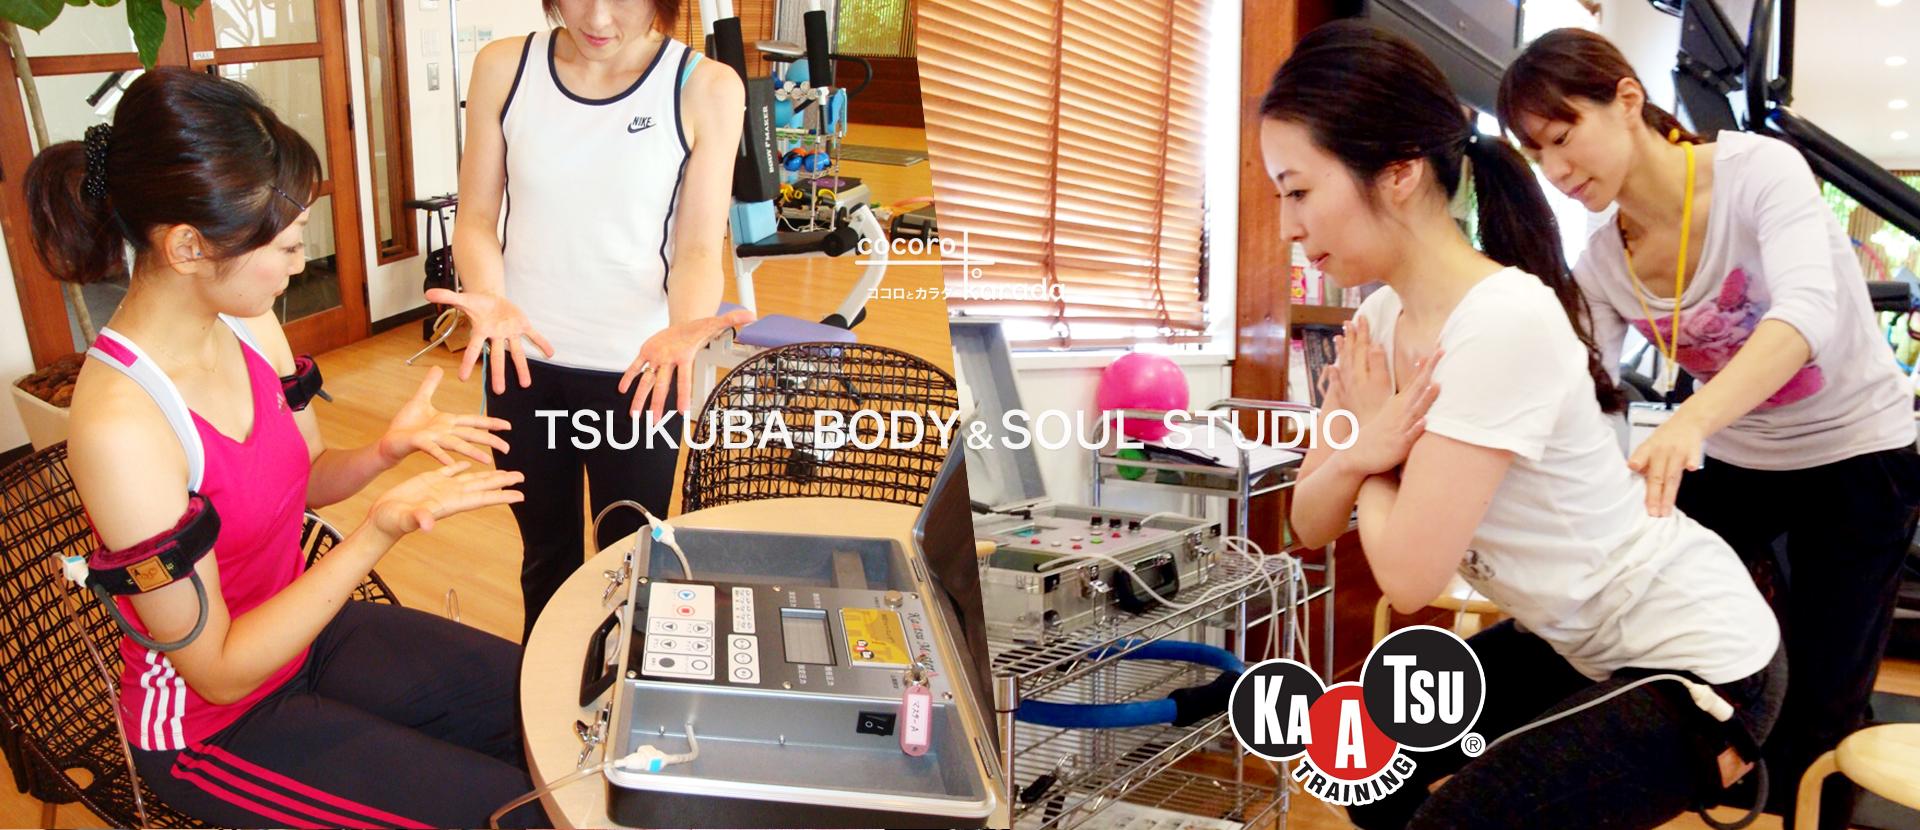 TSUKUBA BODY & SOUL STUDIOの施設画像